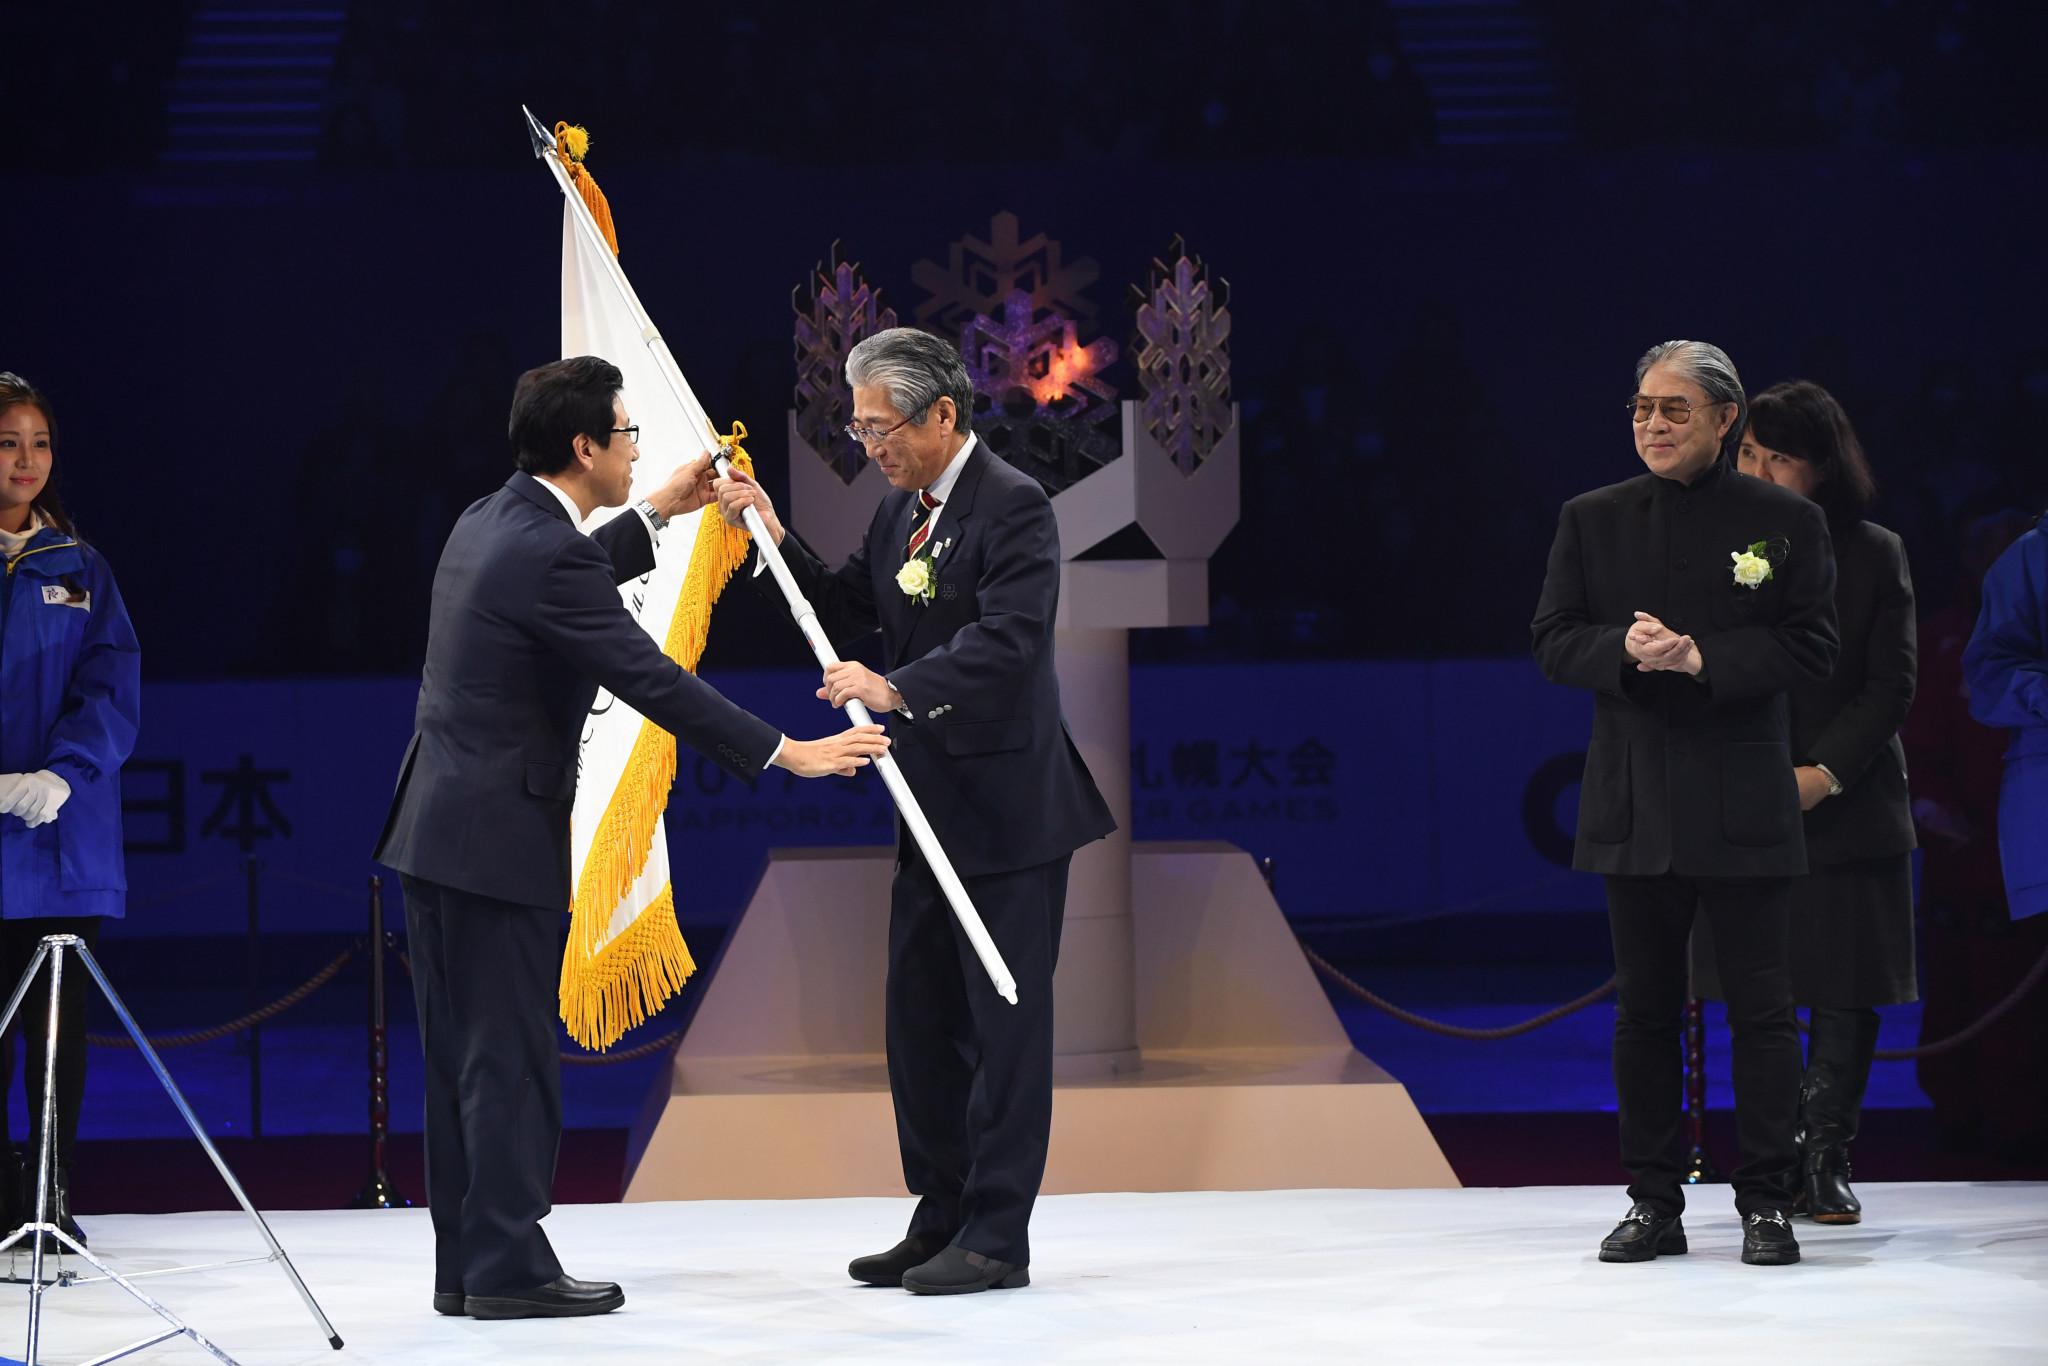 Sapporo Mayor Akimoto Katsuhiro, left, pictured alongside Japanese Olympic Committee President Tsunekazu Takeda ©Getty Images